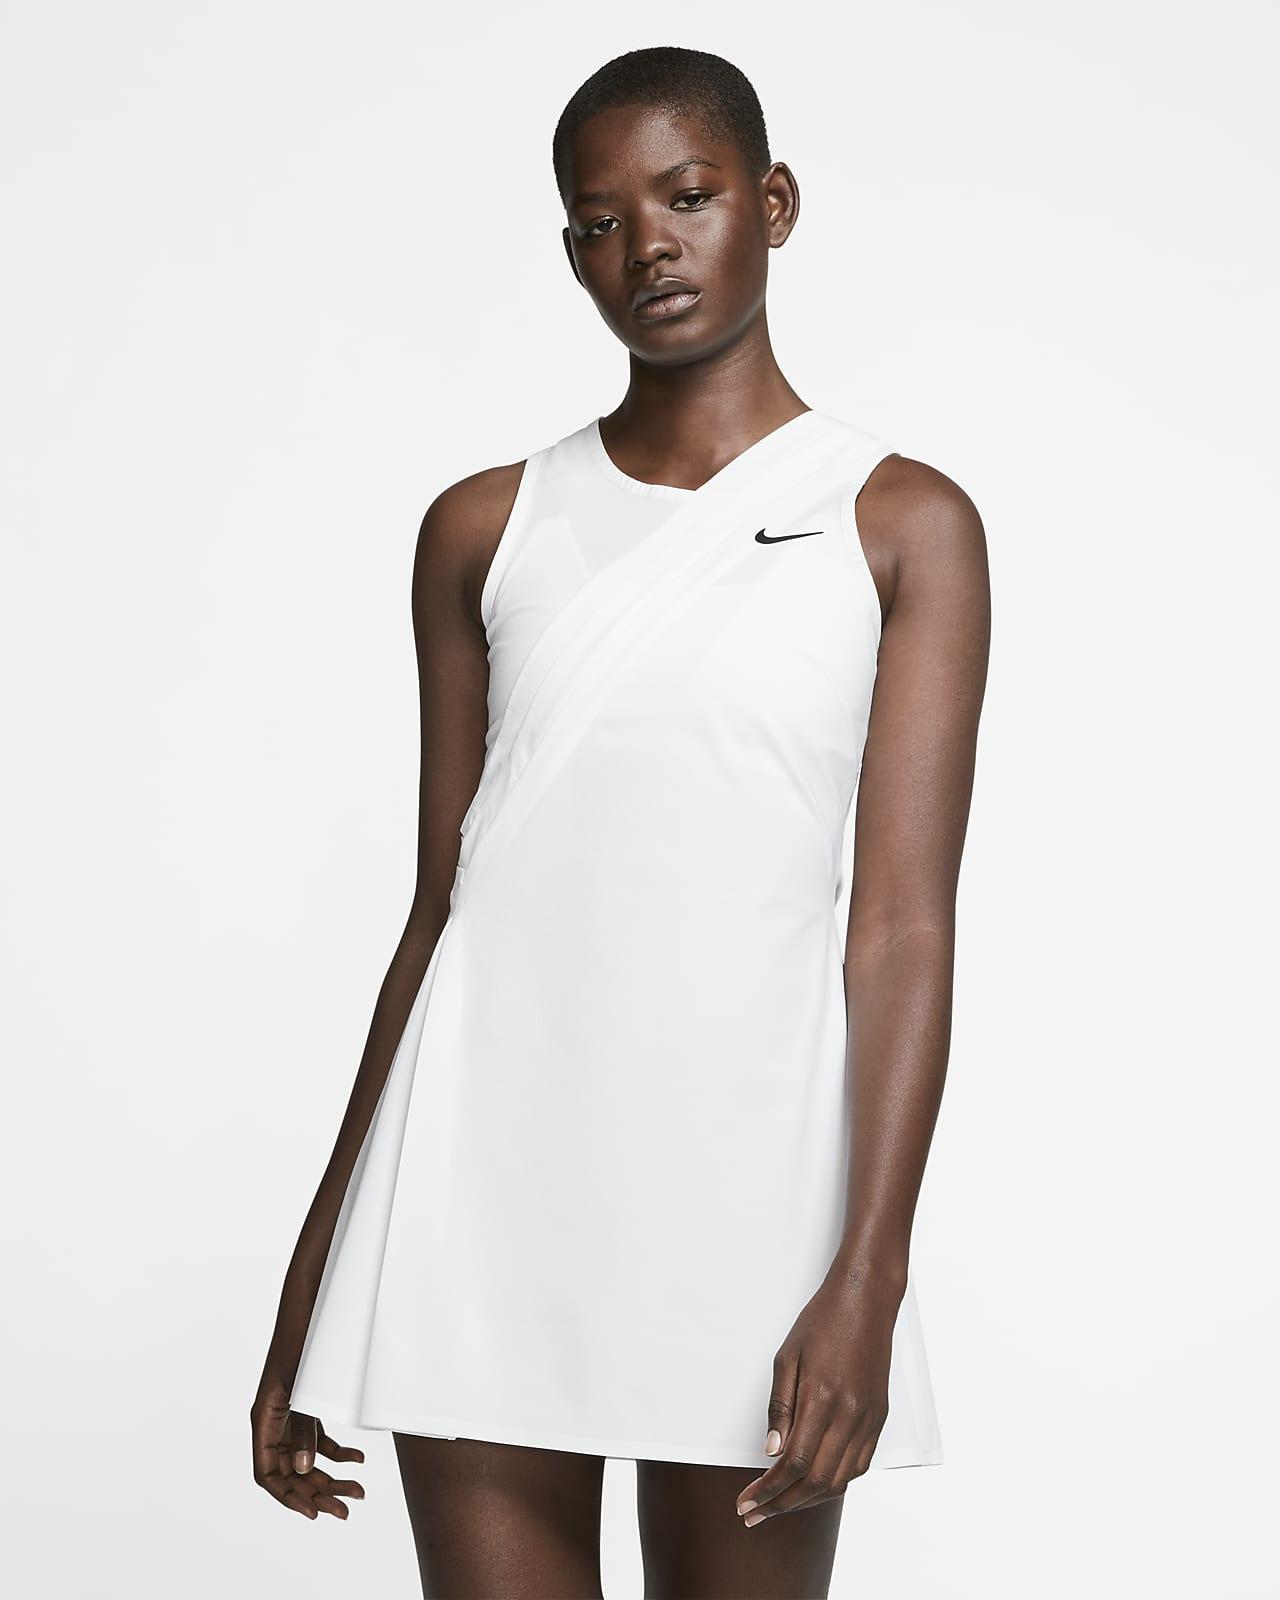 Maria Tennisjurk